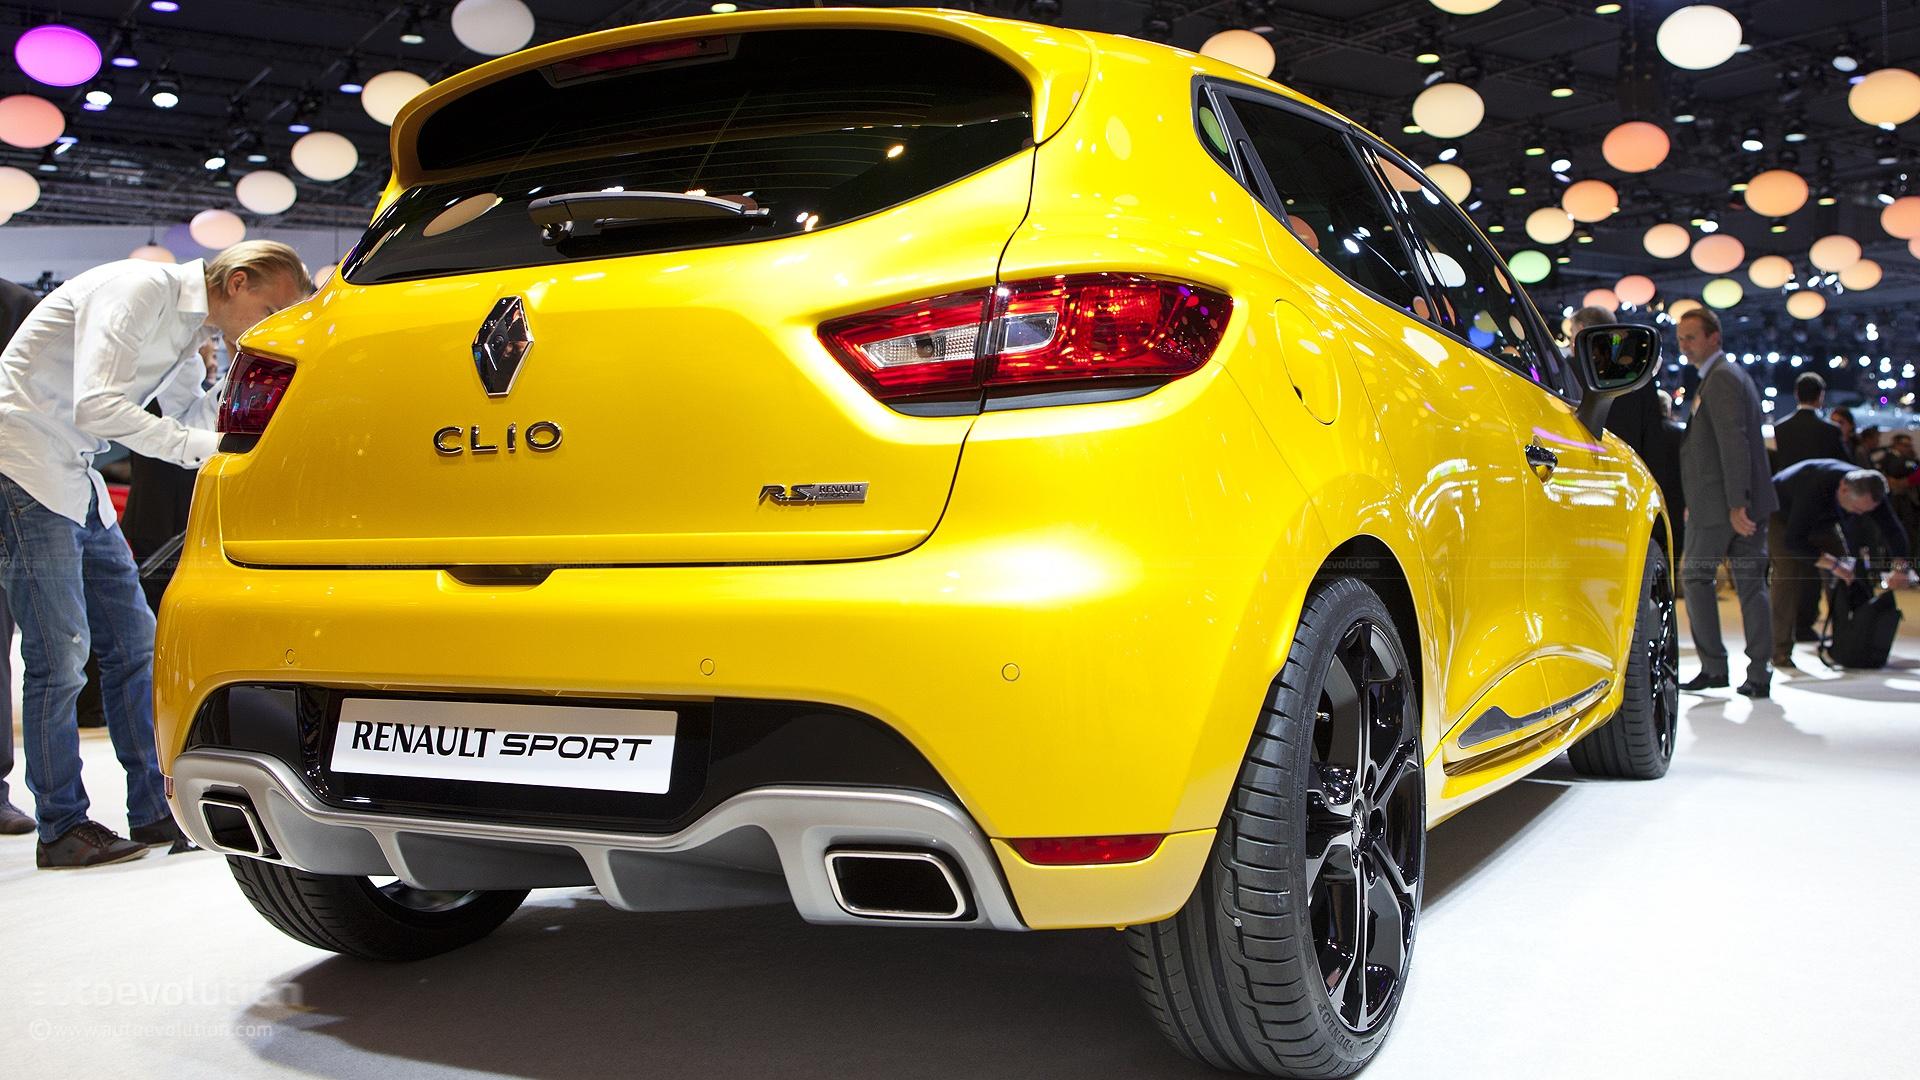 Bardzo dobra Paris 2012: Renault Clio IV RS 200 Turbo with EDC [Live Photos LO55